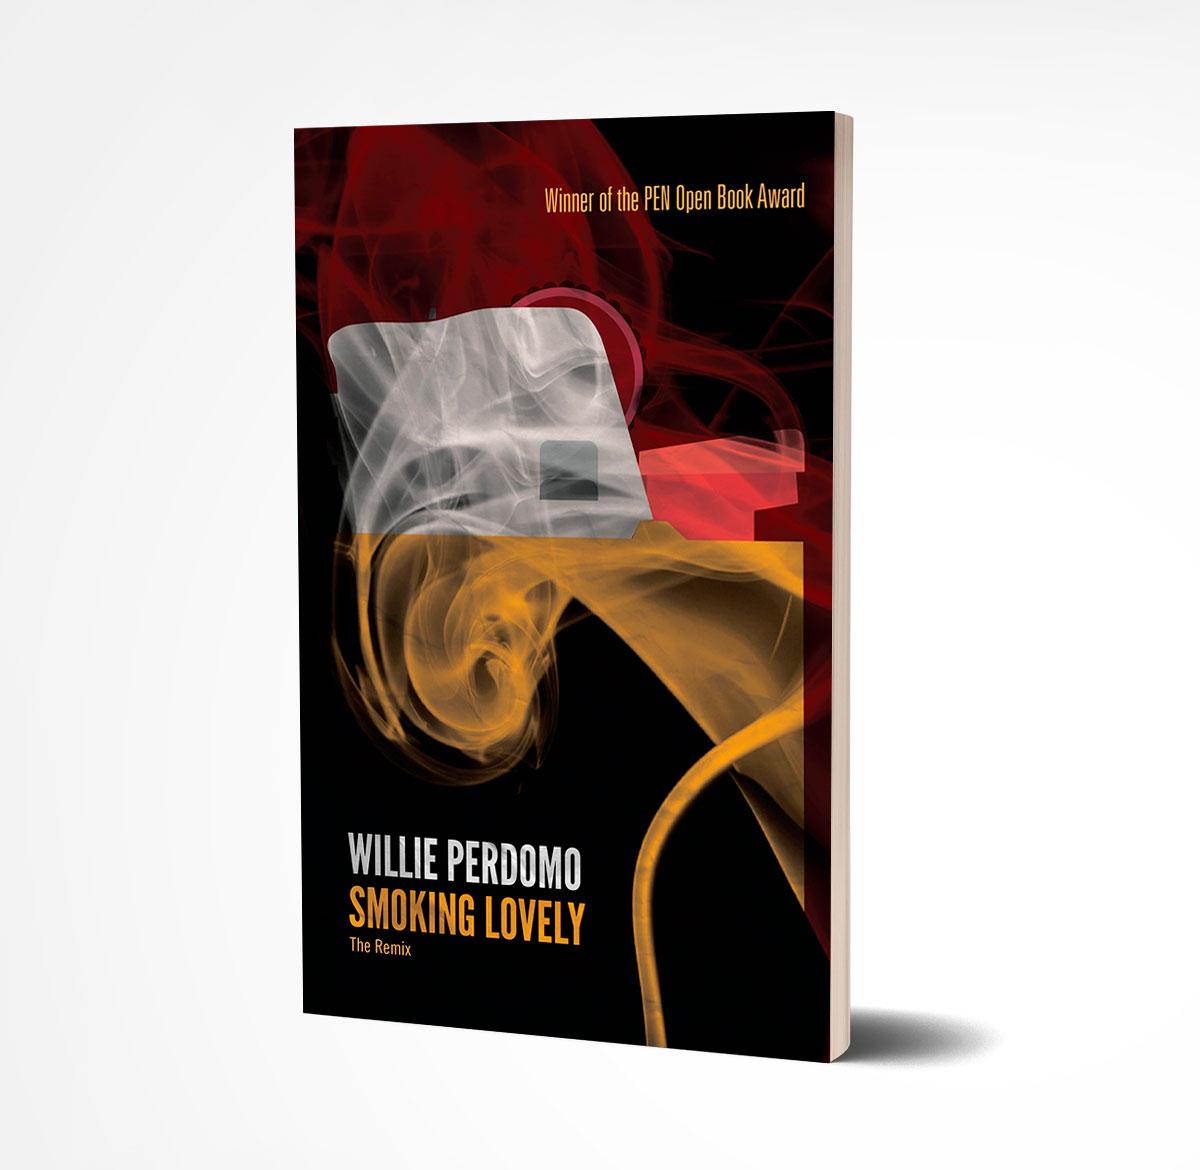 Winner of the PEN Open Book Award